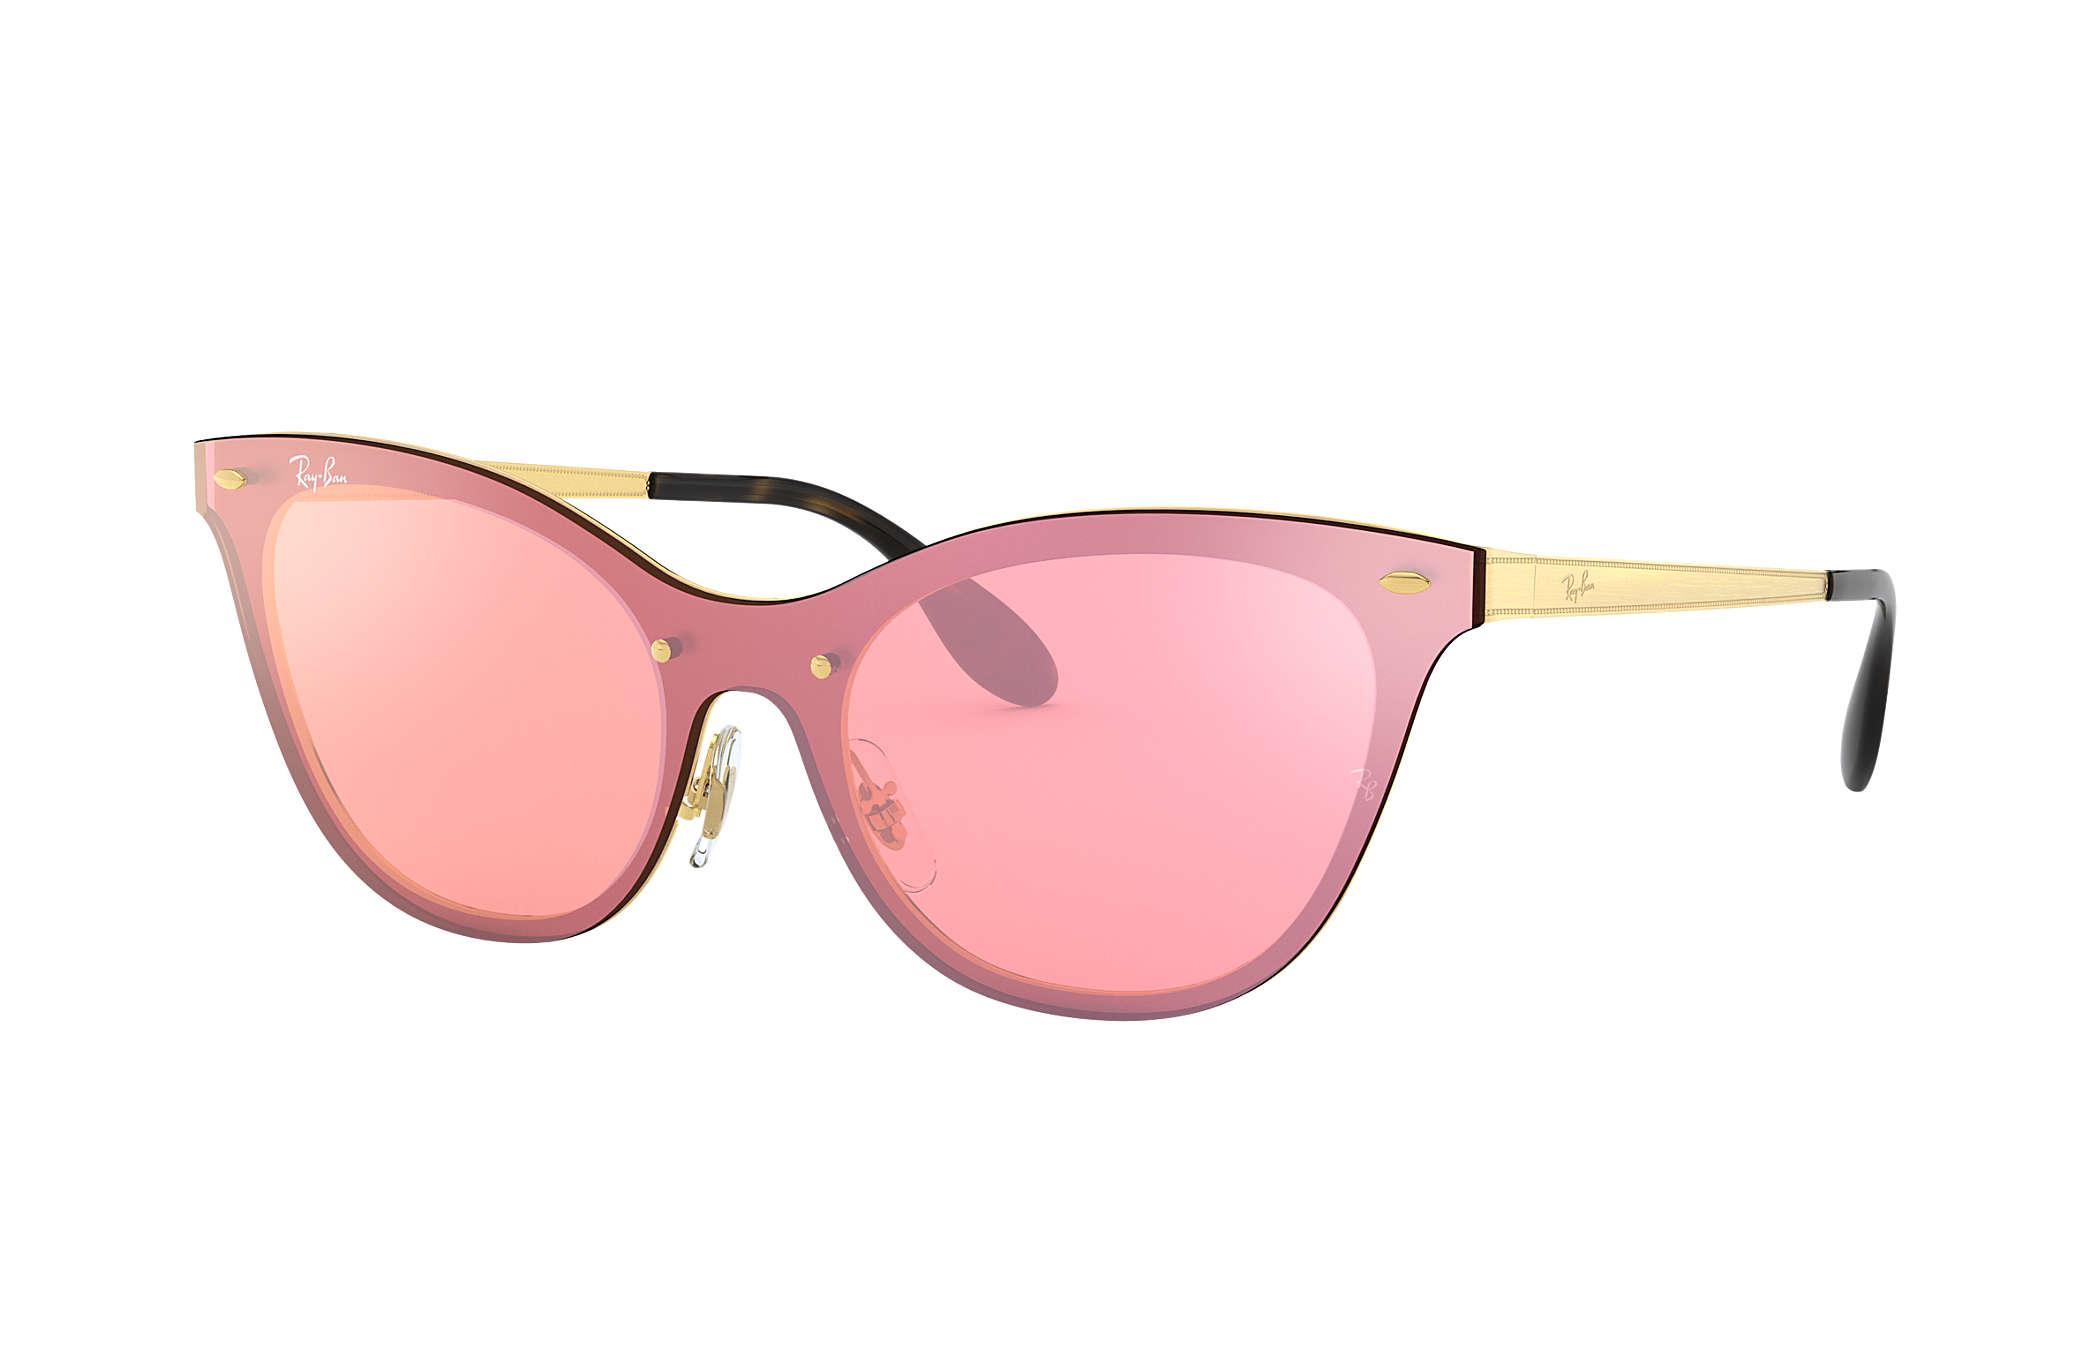 77aed8f2c1 Ray-Ban Blaze Hexagonal RB3579N Gold - Metal - Pink Lenses ...